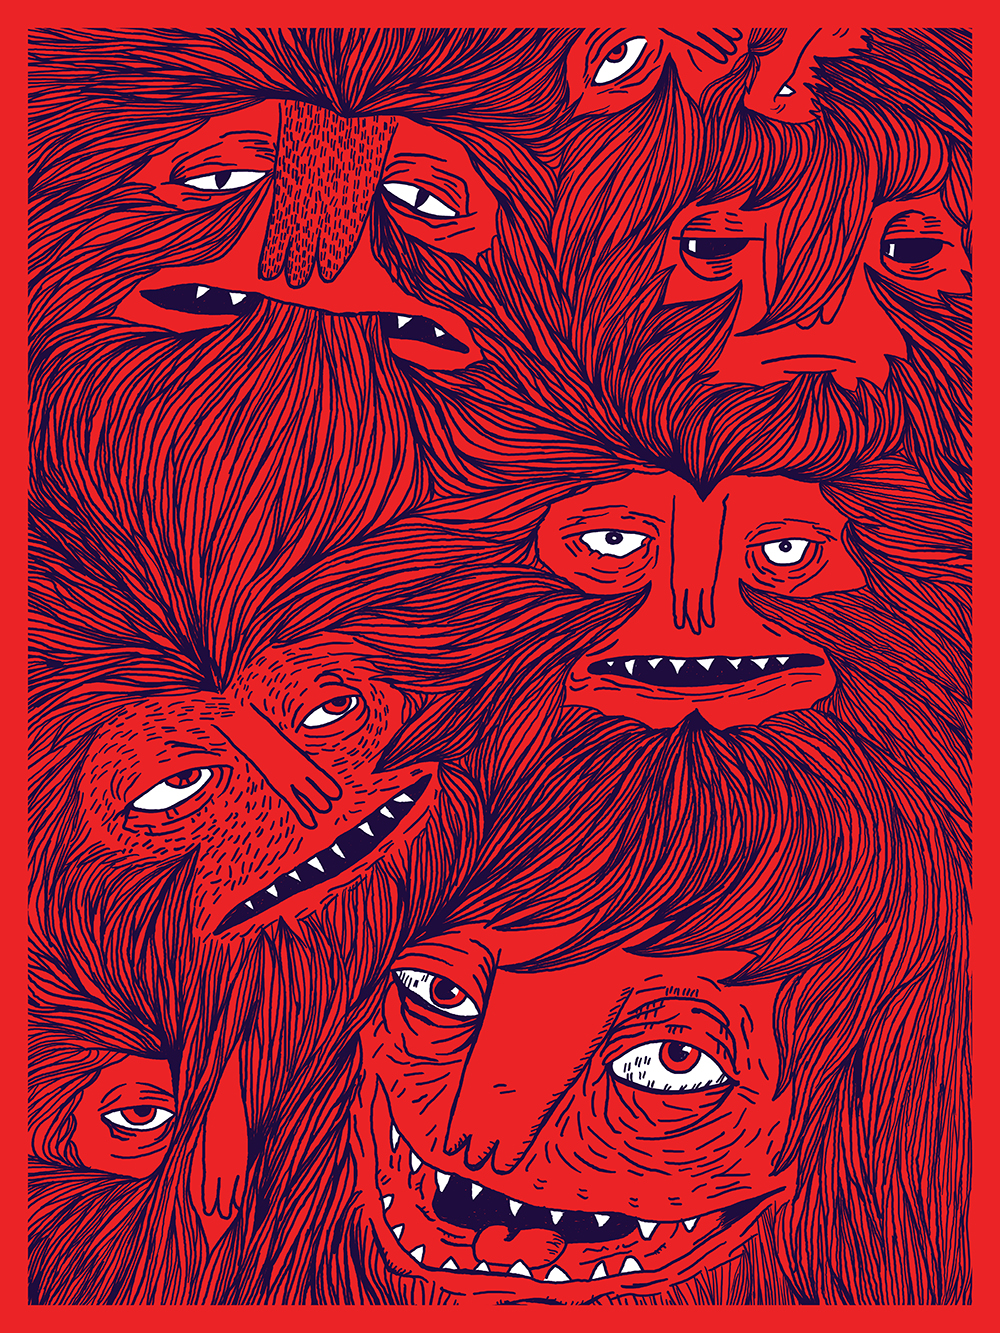 Hairwolves